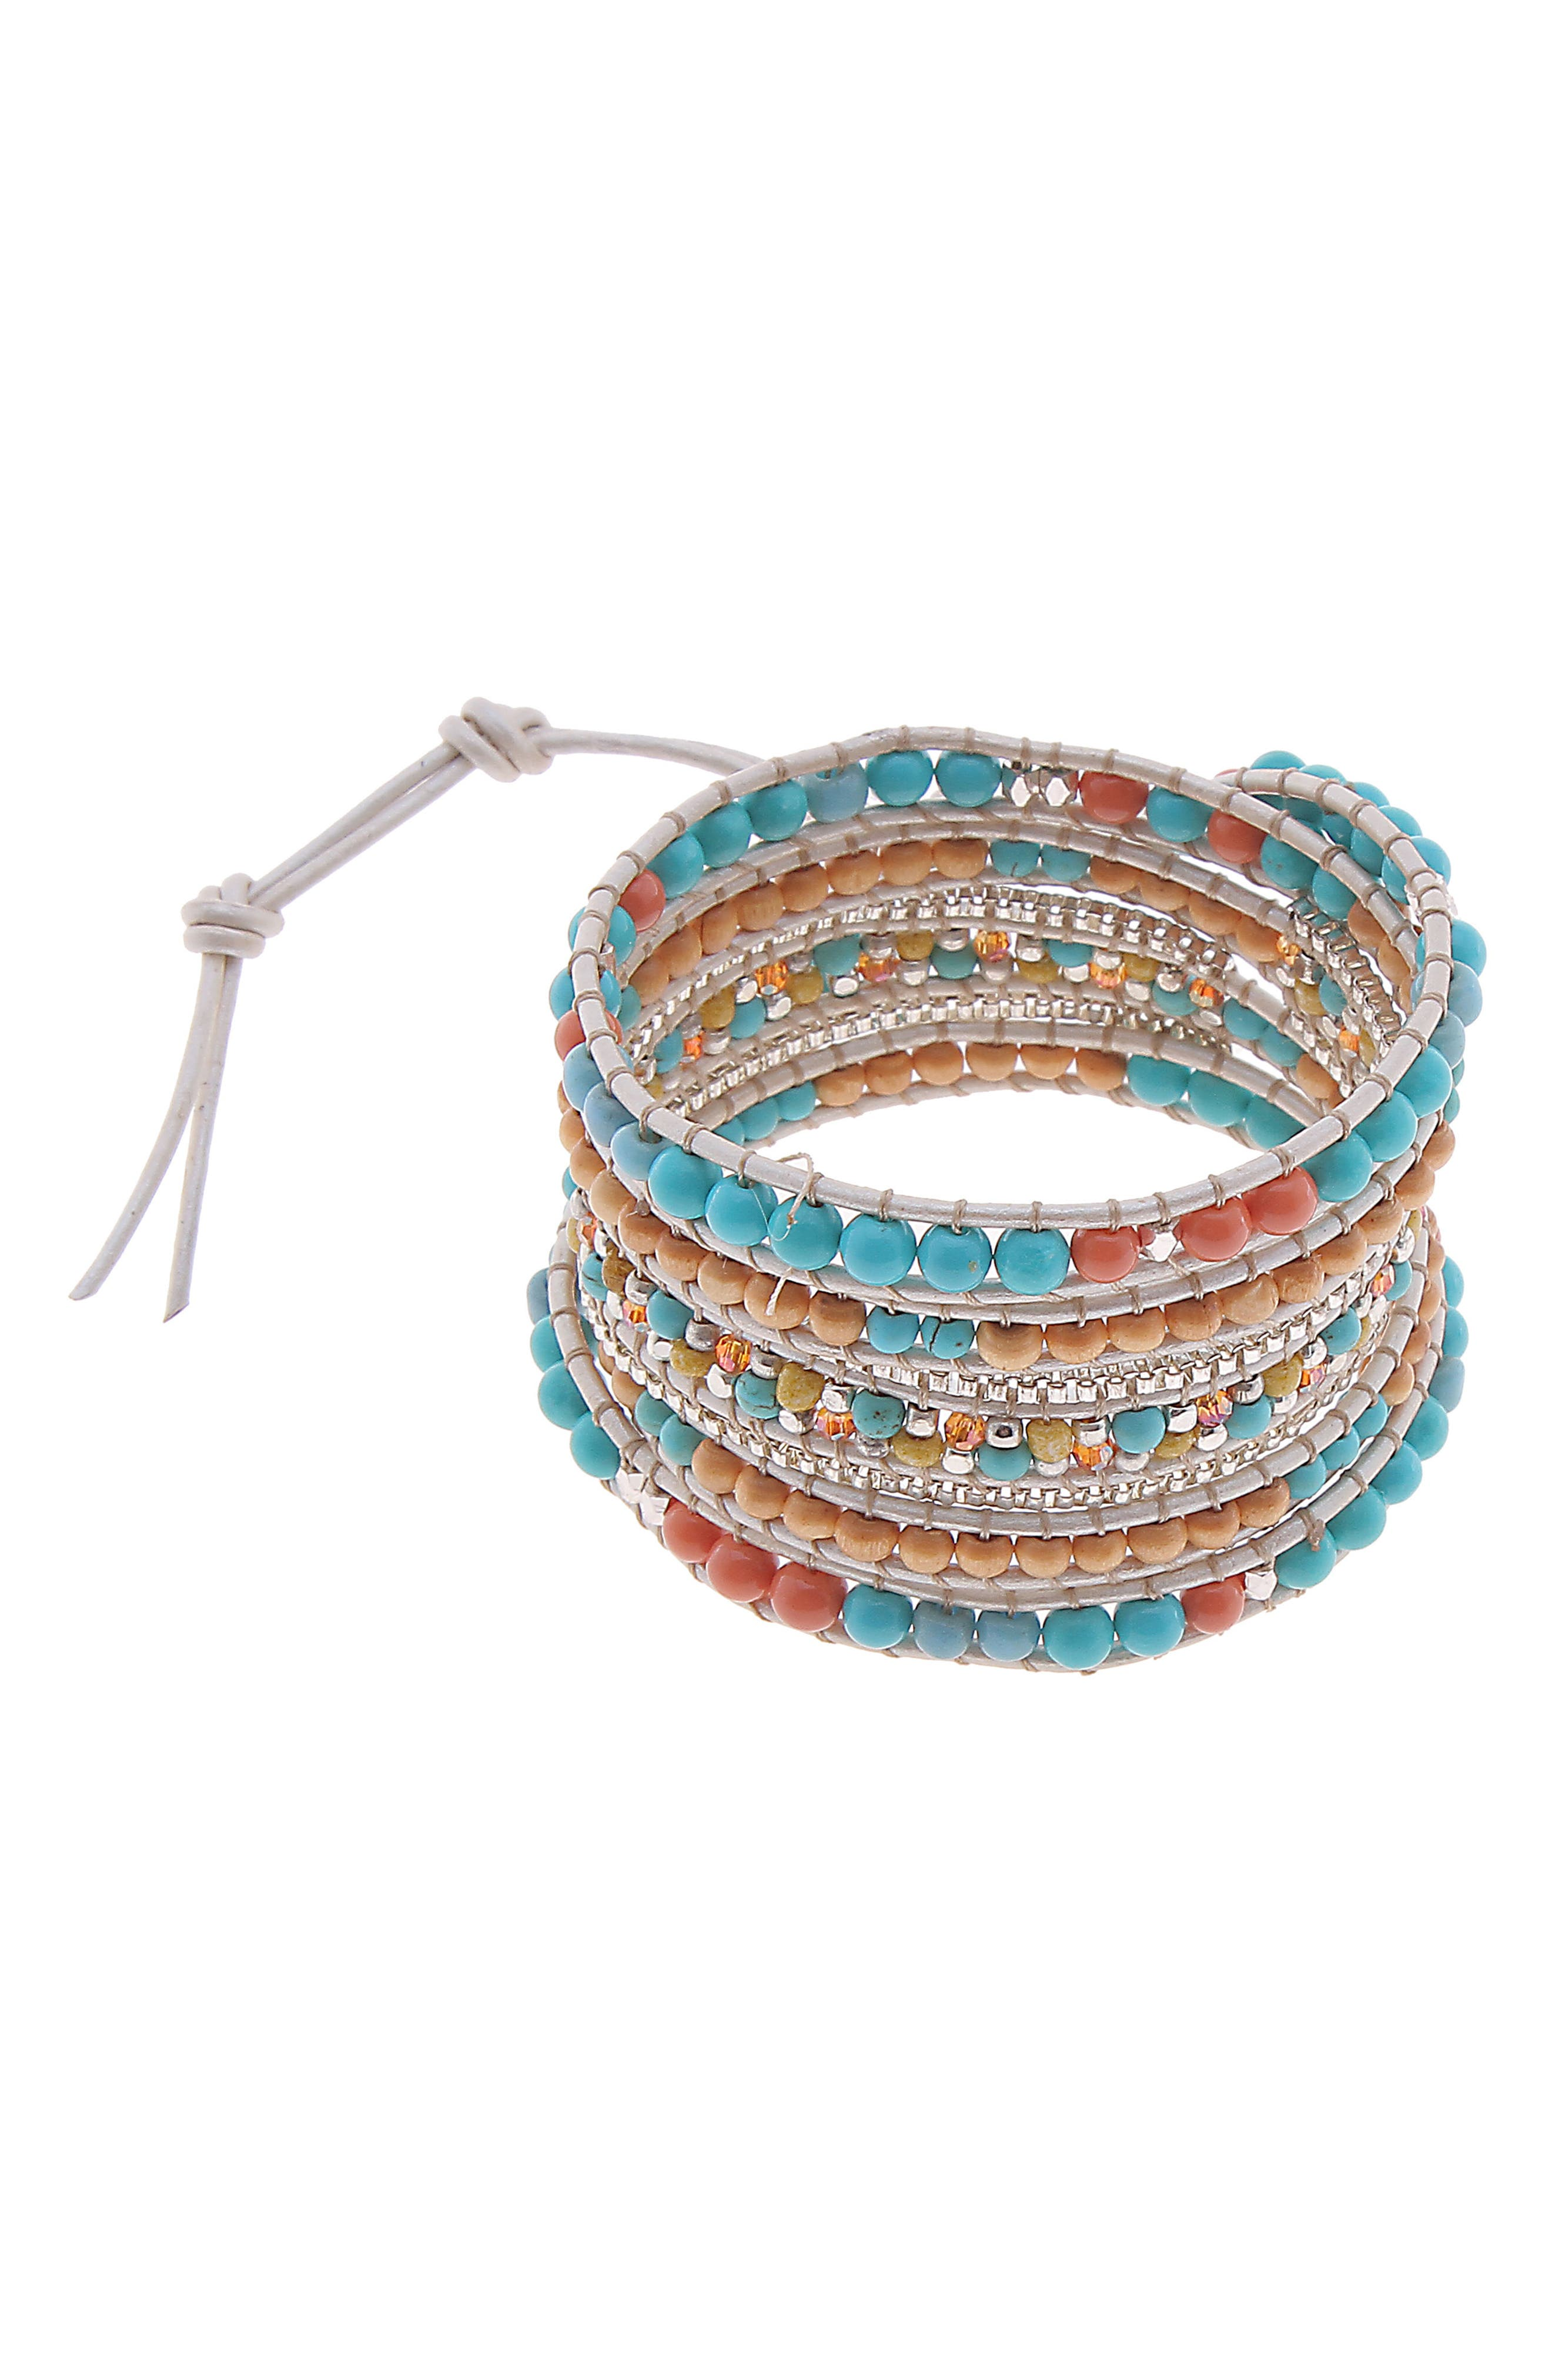 All Stone Wrap Bracelet,                             Main thumbnail 1, color,                             TURQUOISE